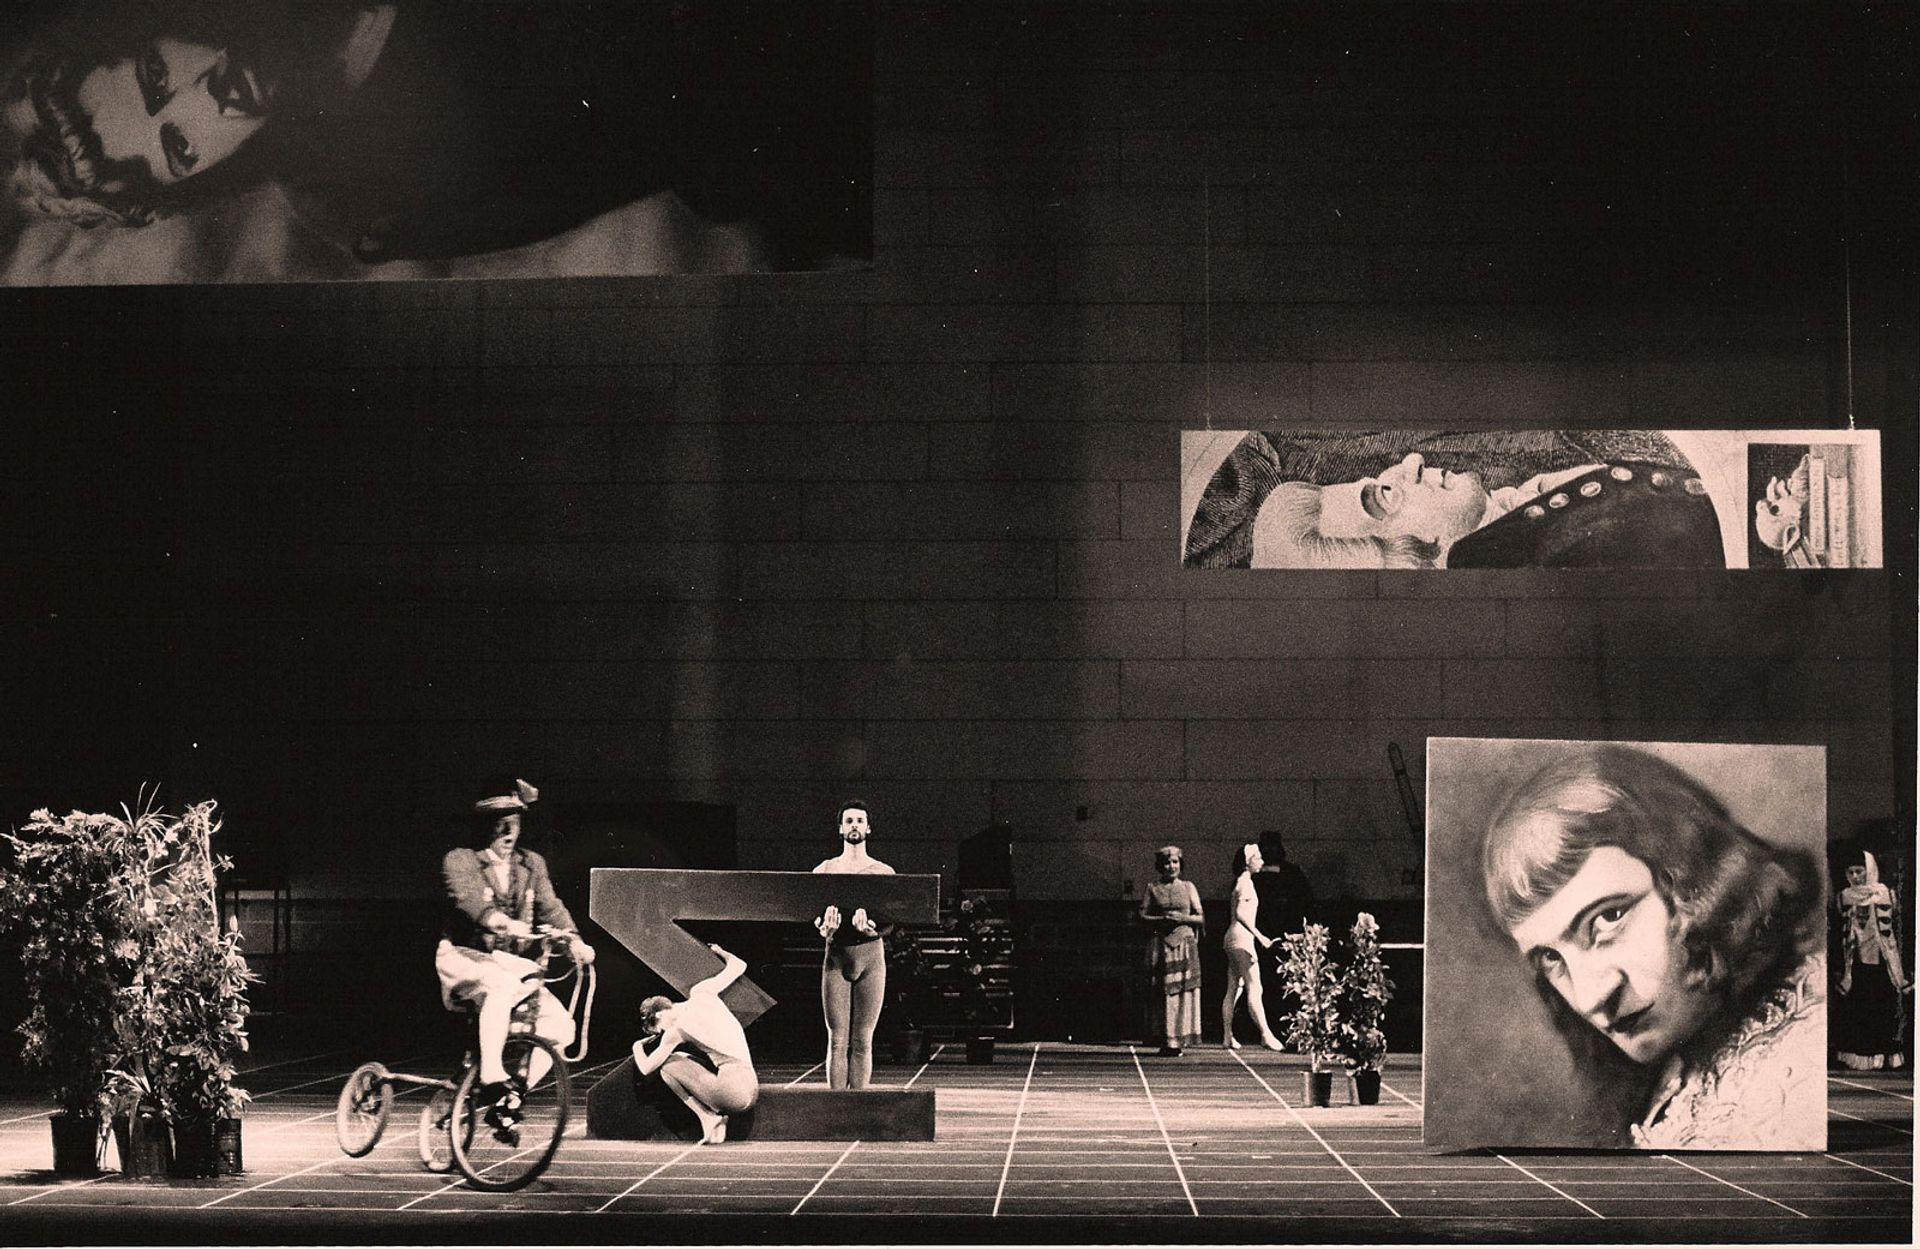 Europeras 1 & 2 by John Cage, whose ideas influenced Fluxus Beatriz Schiller; courtesy of the John Cage Trust